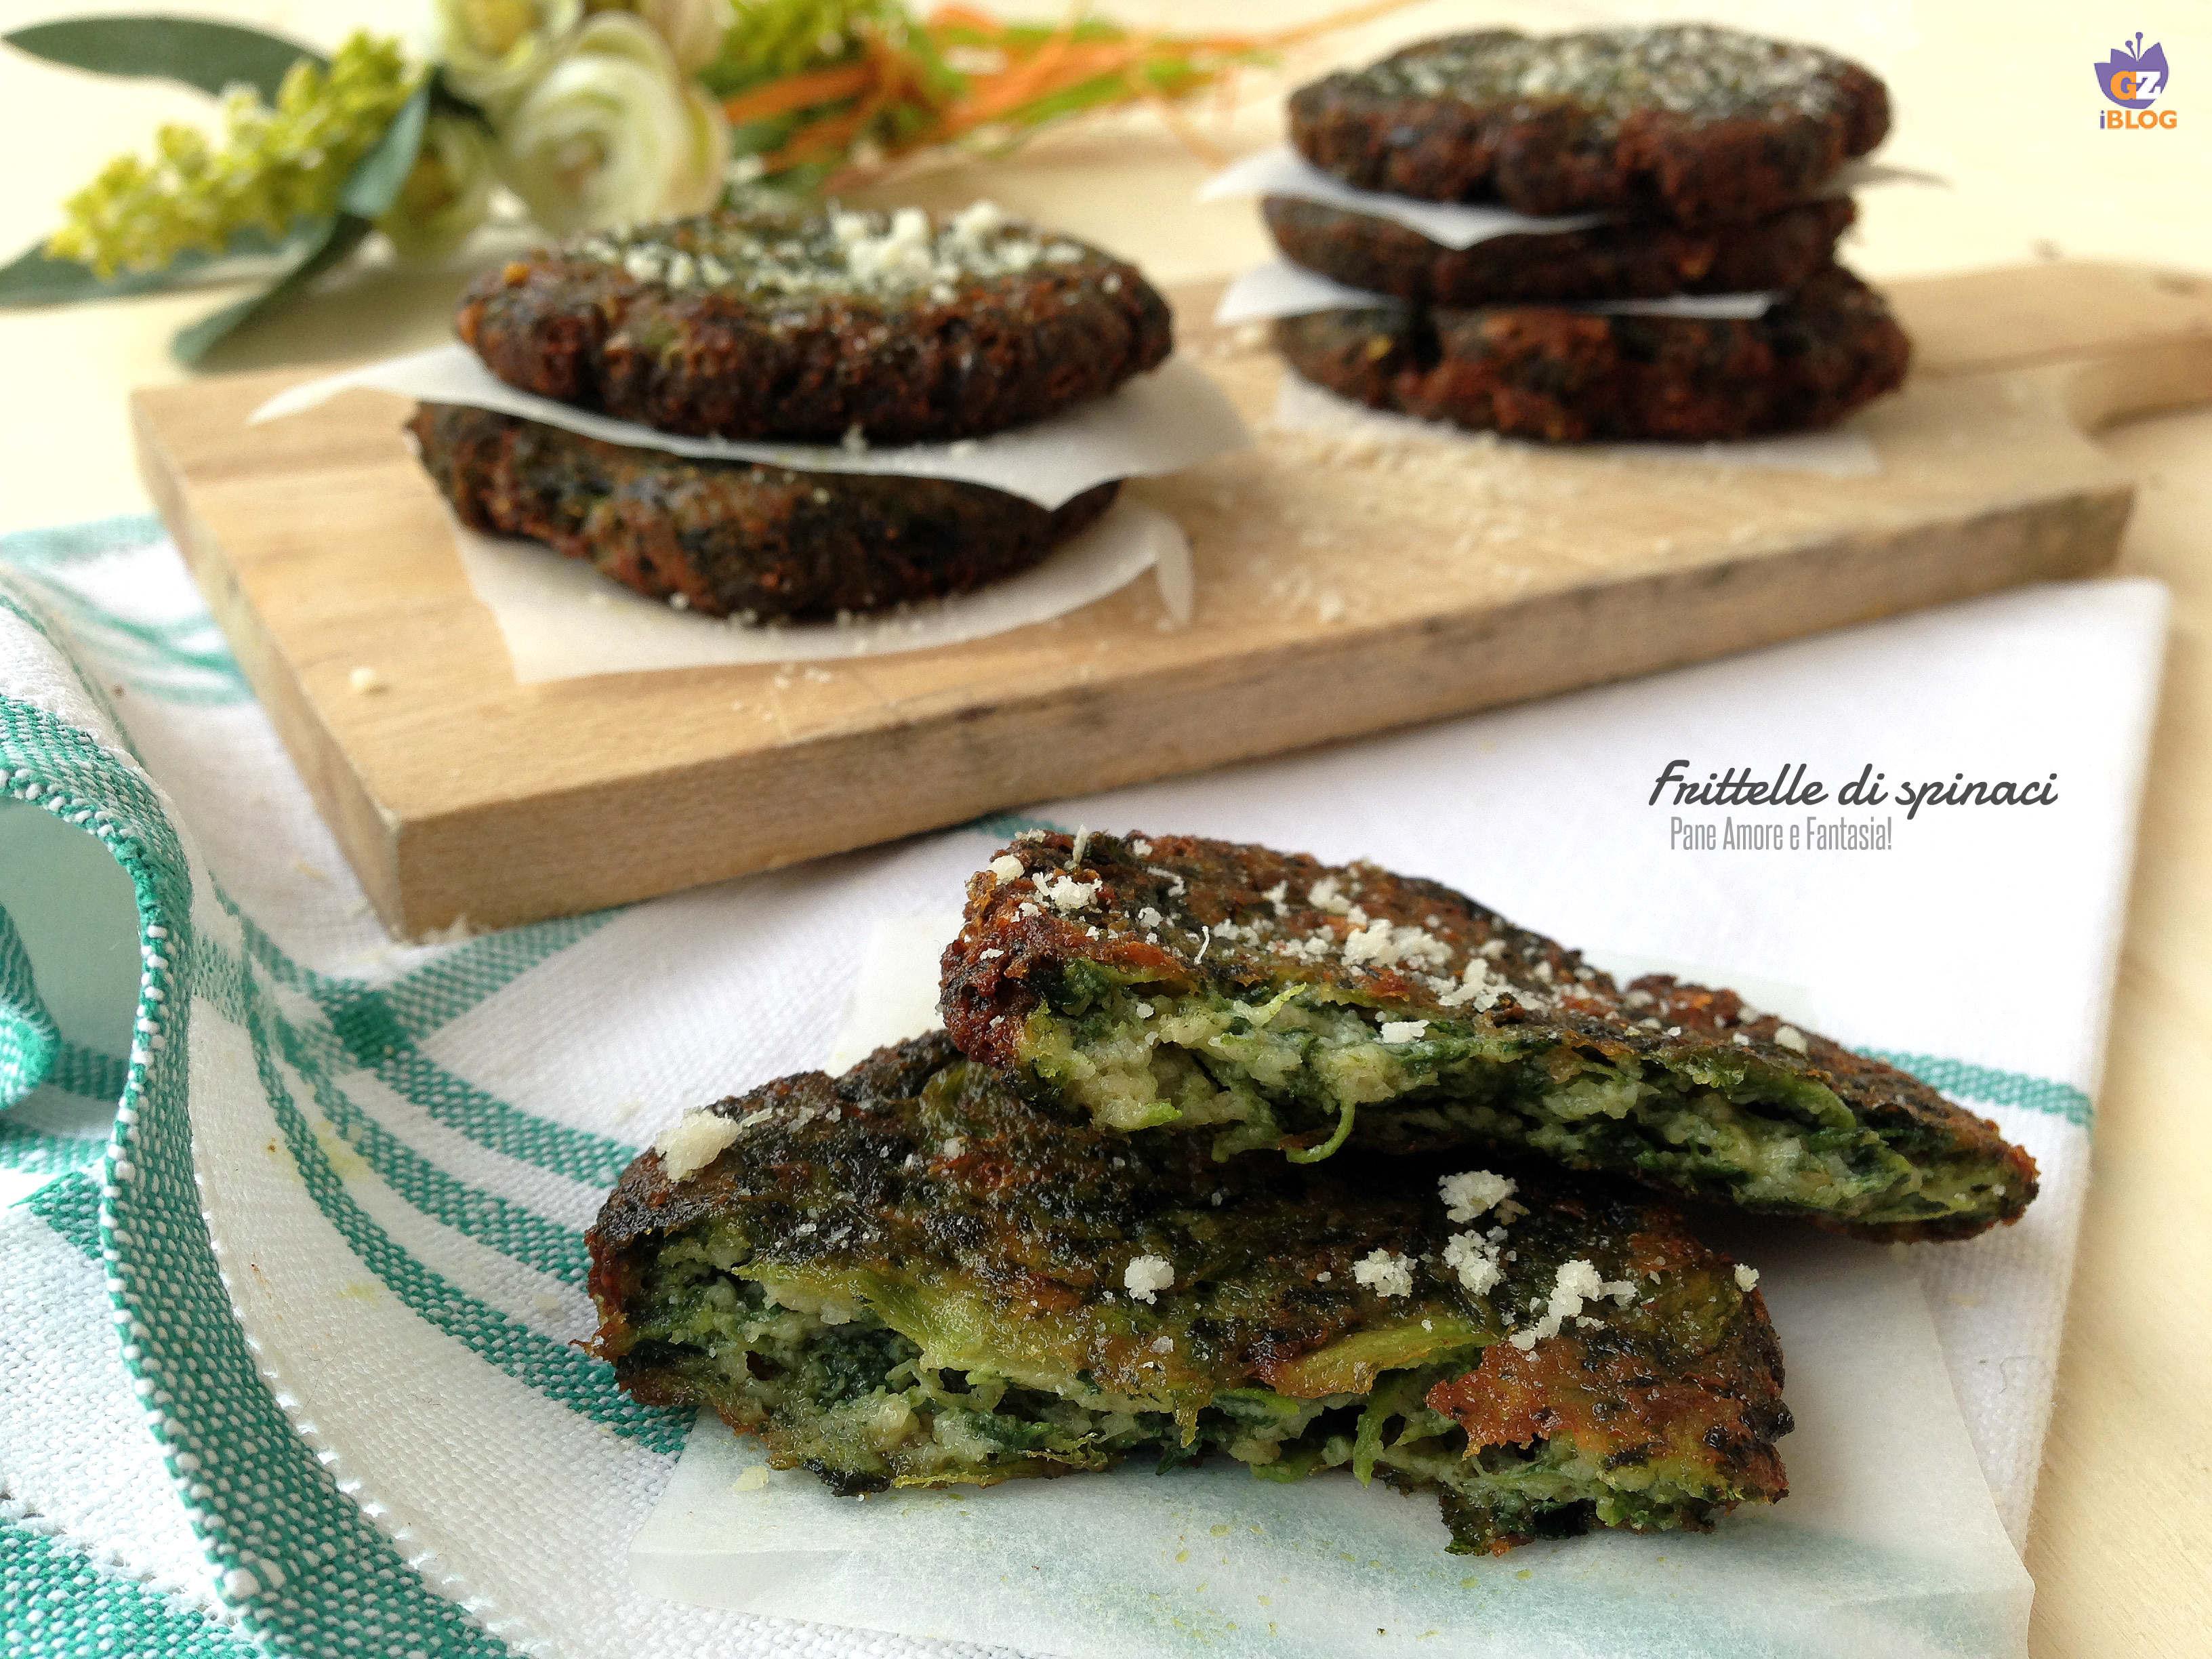 frittelle di spinaci o